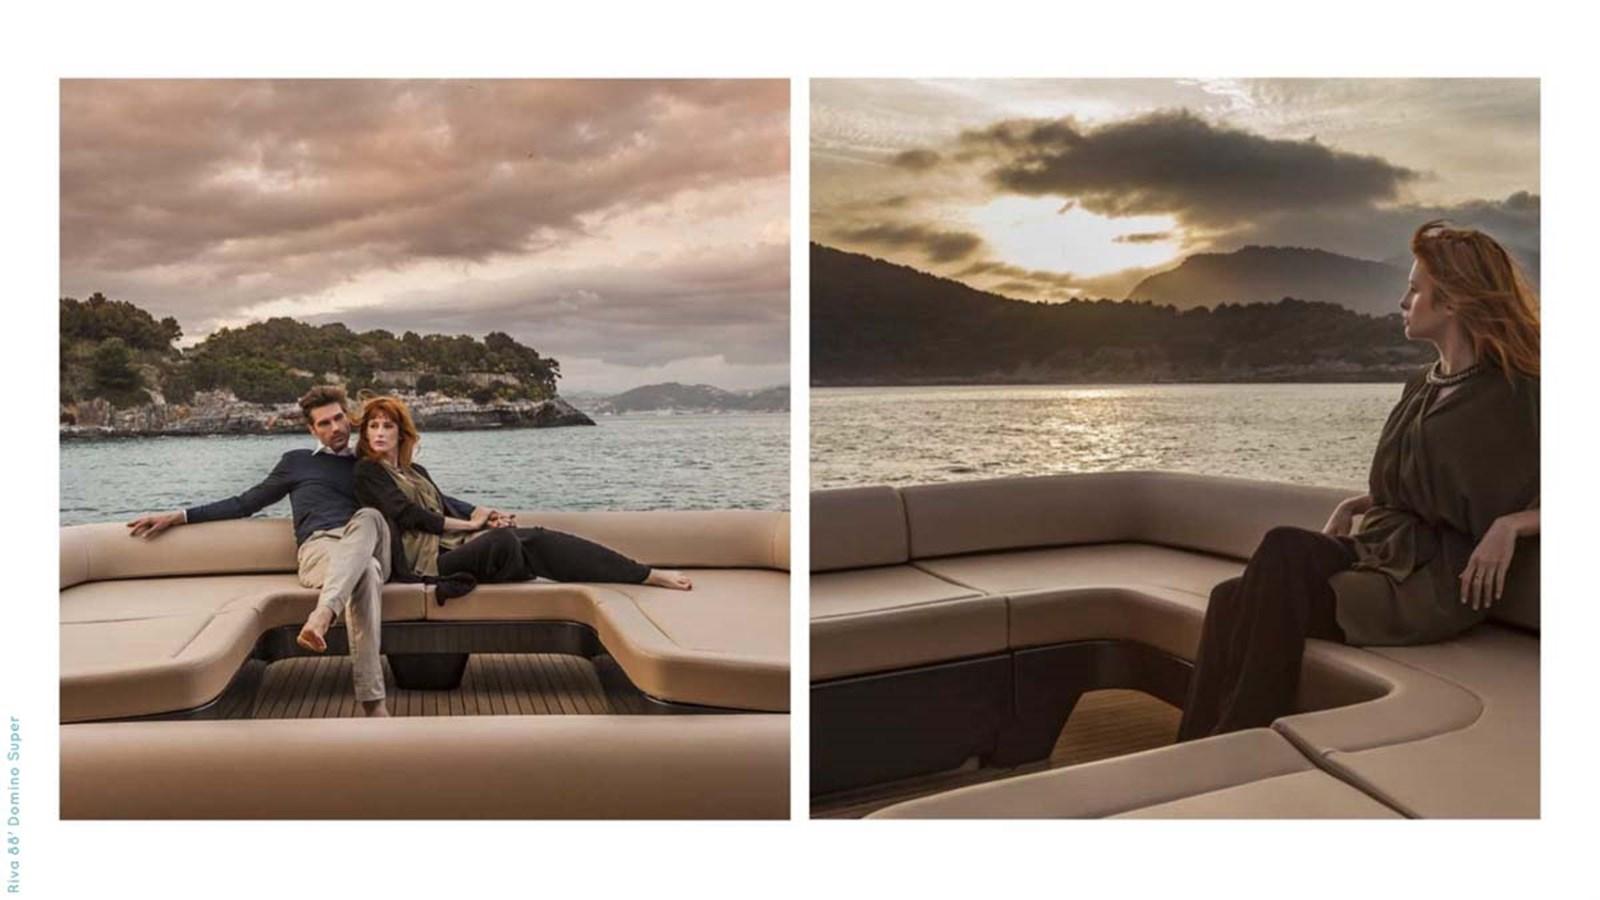 8706-Riva 88 Domino Super 2017 RIVAL YACHTS INC  Motor Yacht 2851234